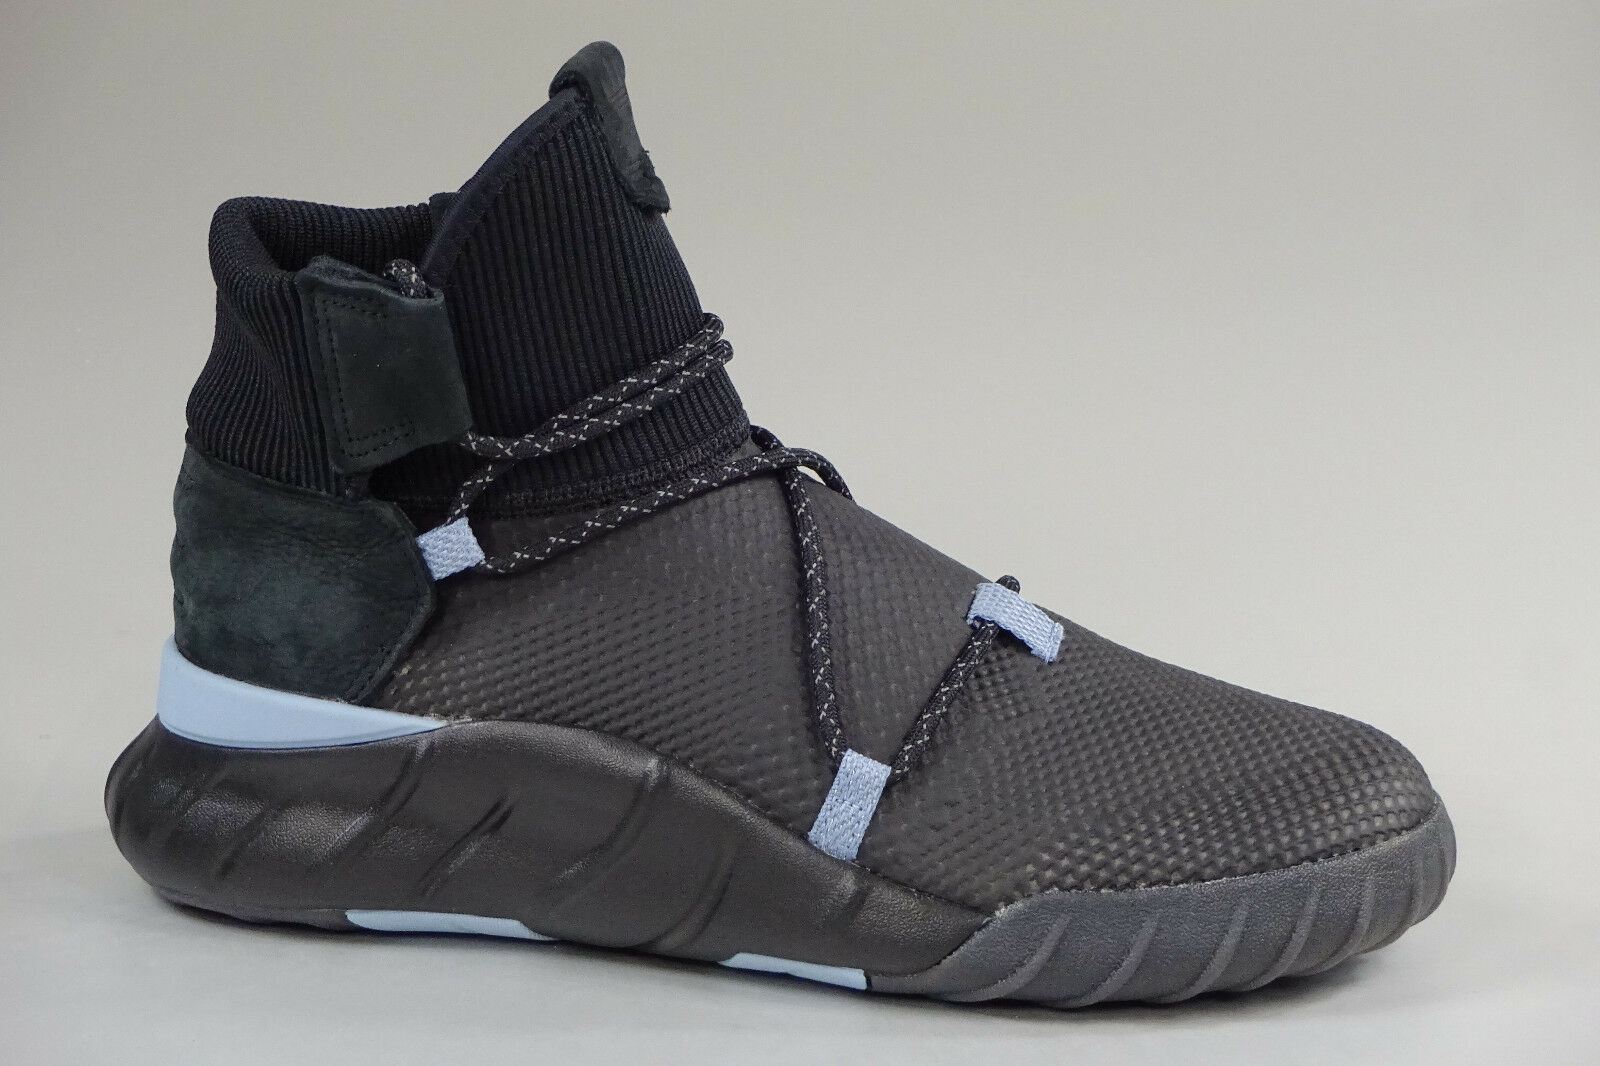 Adidas Originals Tubular x 2.0 PK cq1373 Running Basket Retro Chaussures 44